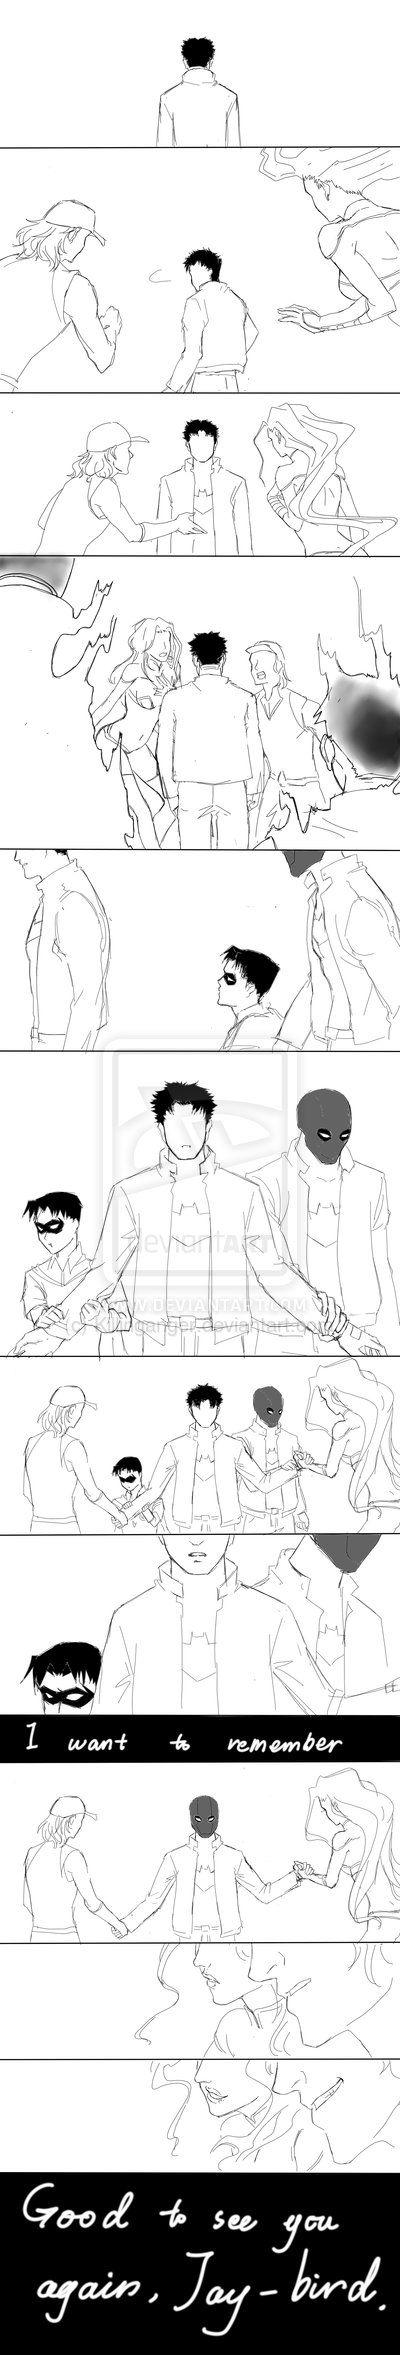 Jason (page 3) by Killinganger.deviantart.com on @deviantART